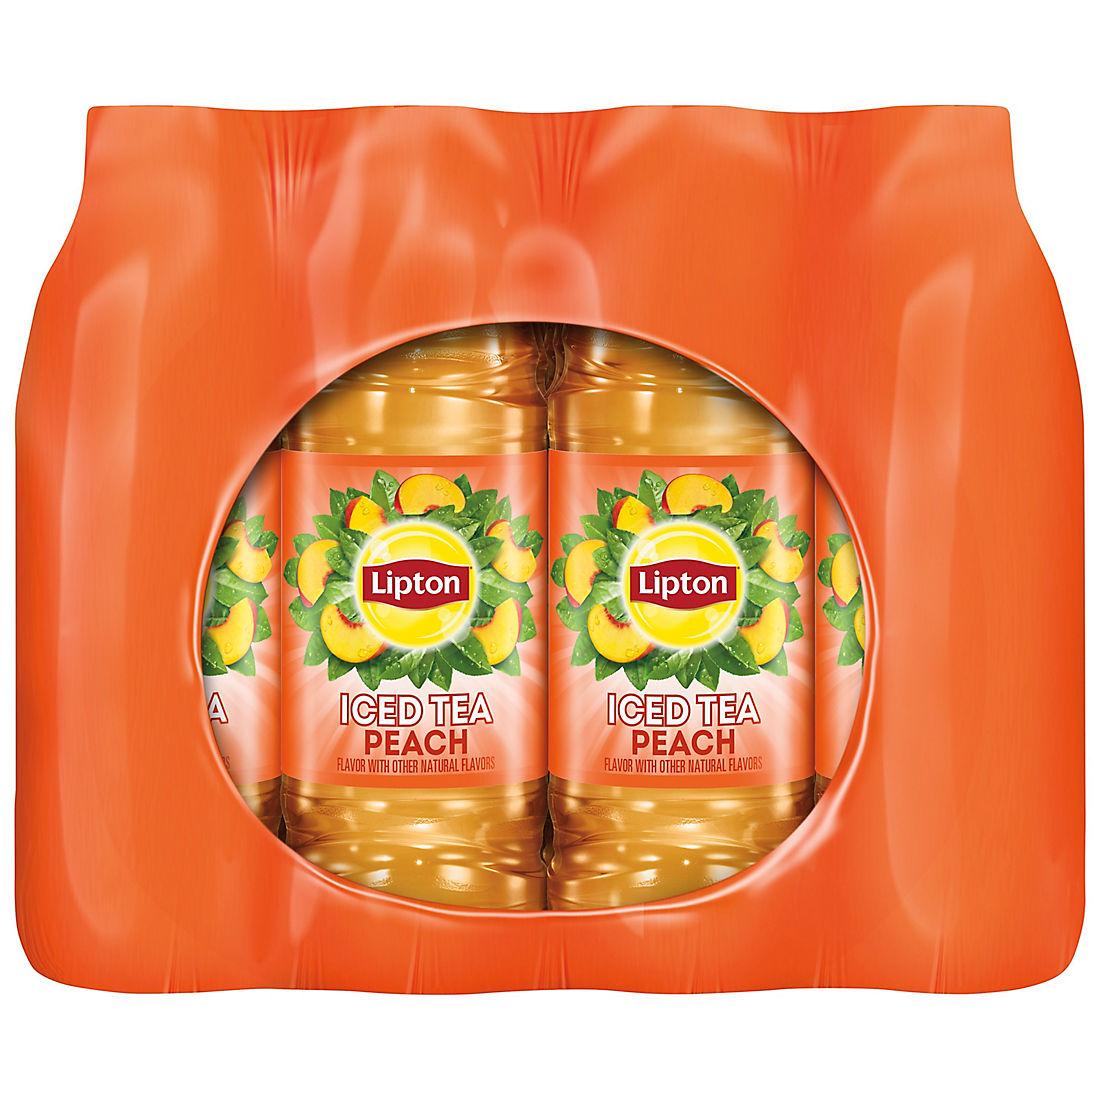 Lipton Peach Iced Tea, 24 pk./16.9 oz